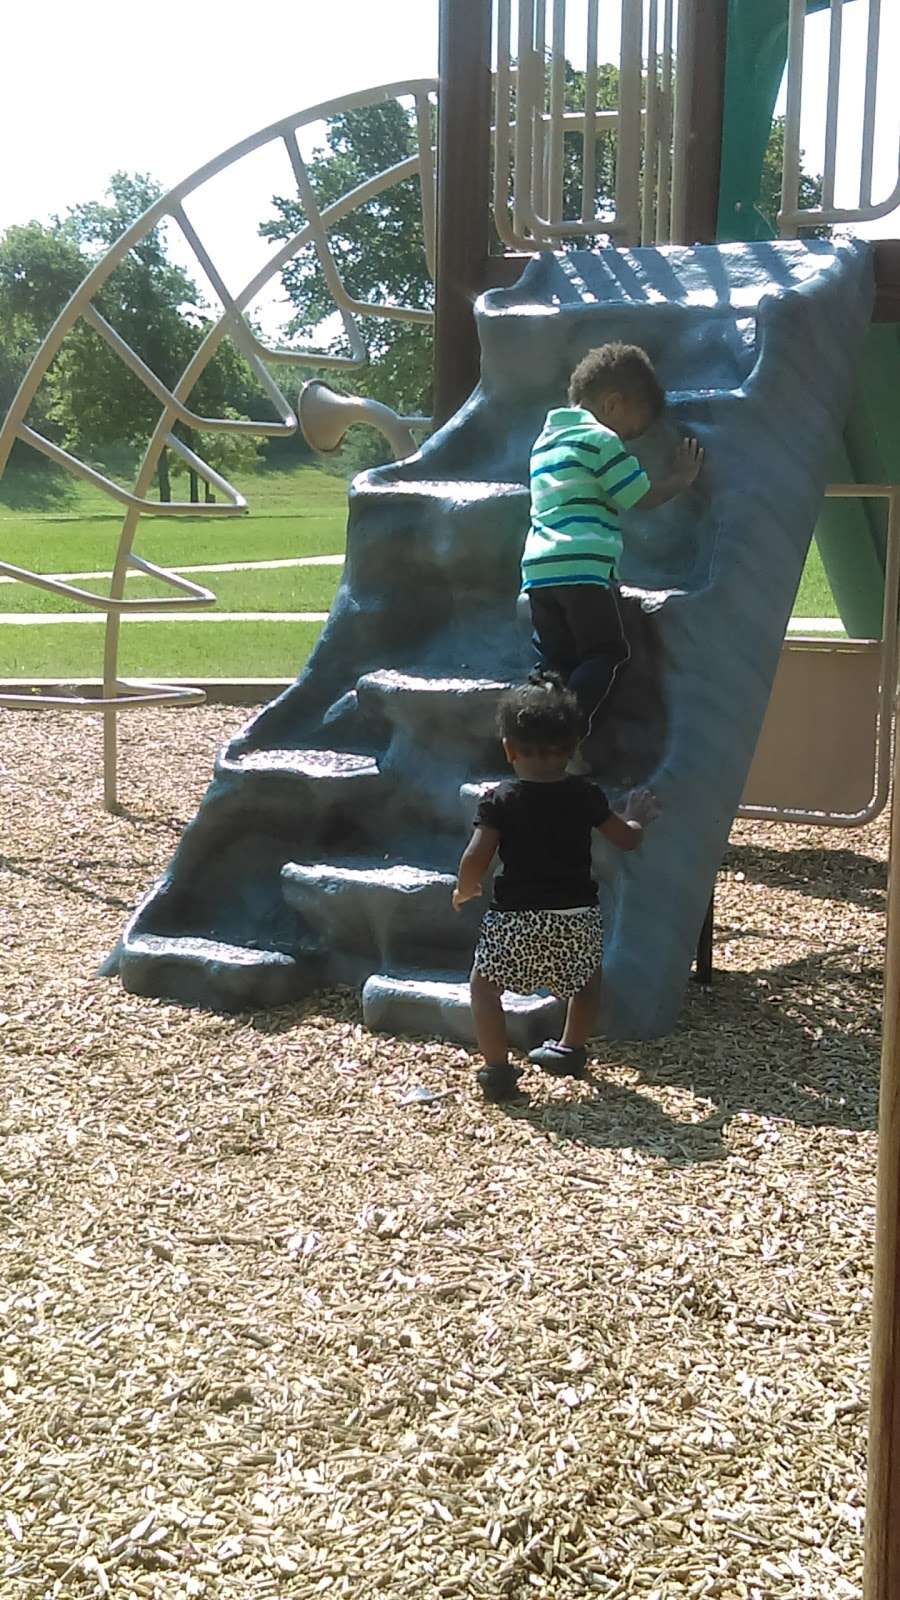 Fox Creek Greenbelt Park - park  | Photo 6 of 9 | Address: Lewisville, TX 75067, USA